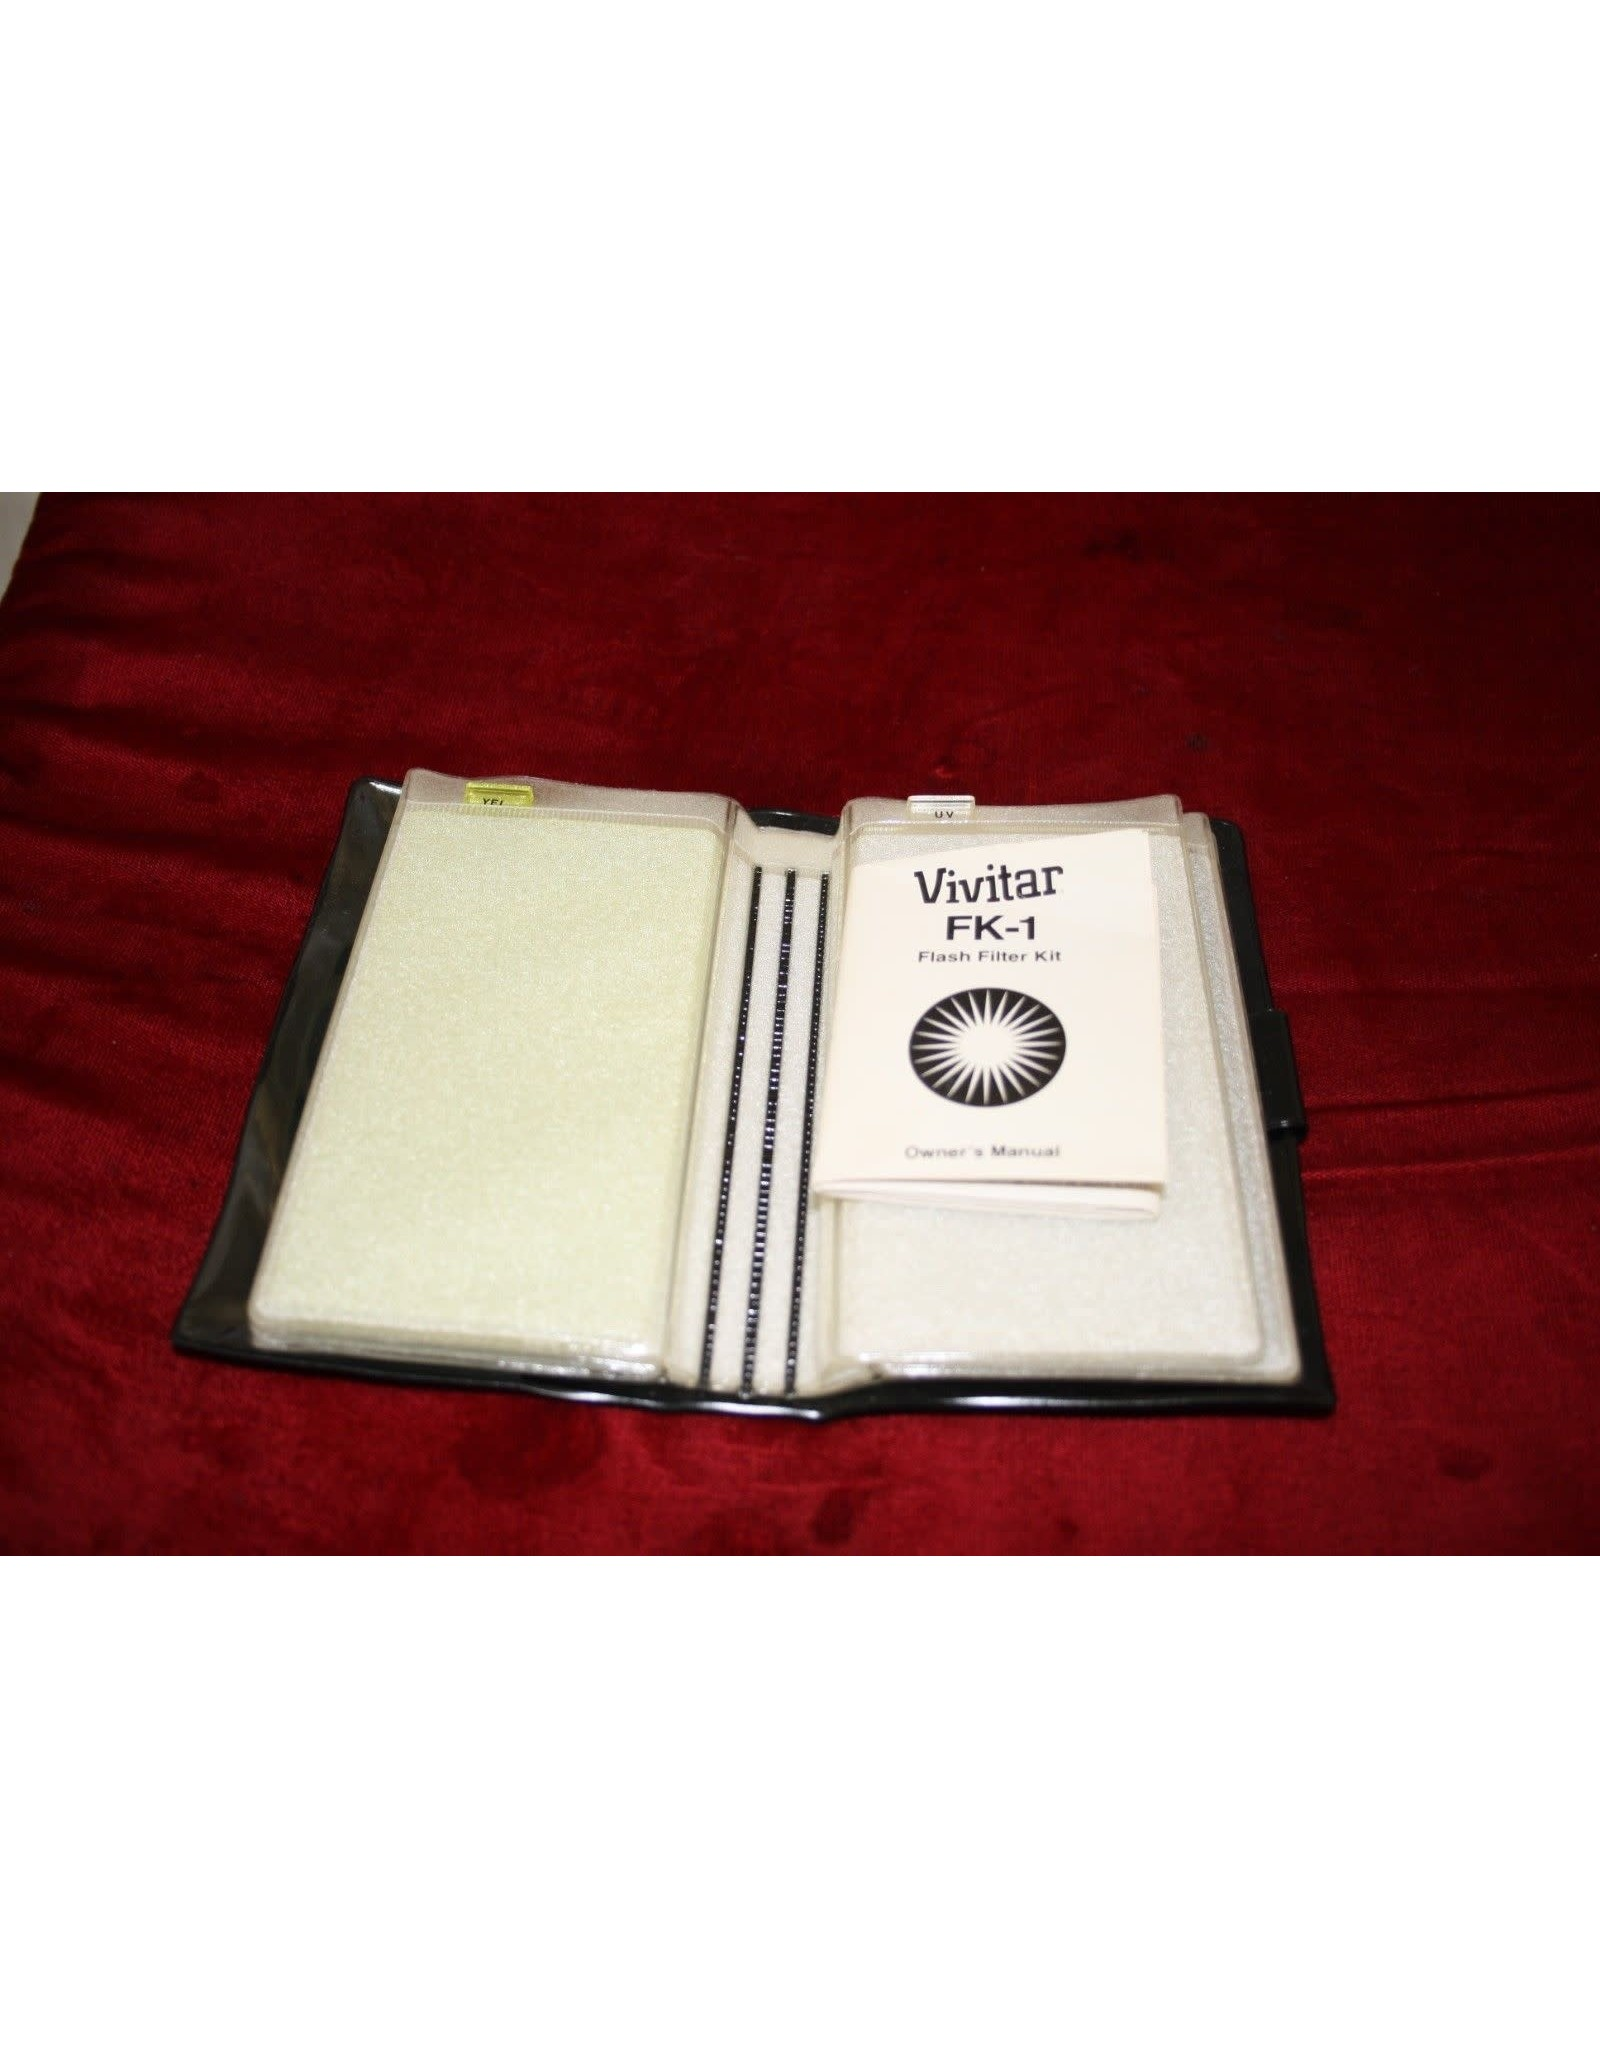 Vivitar FK-1 Flash Filter Kit for 283 Flash